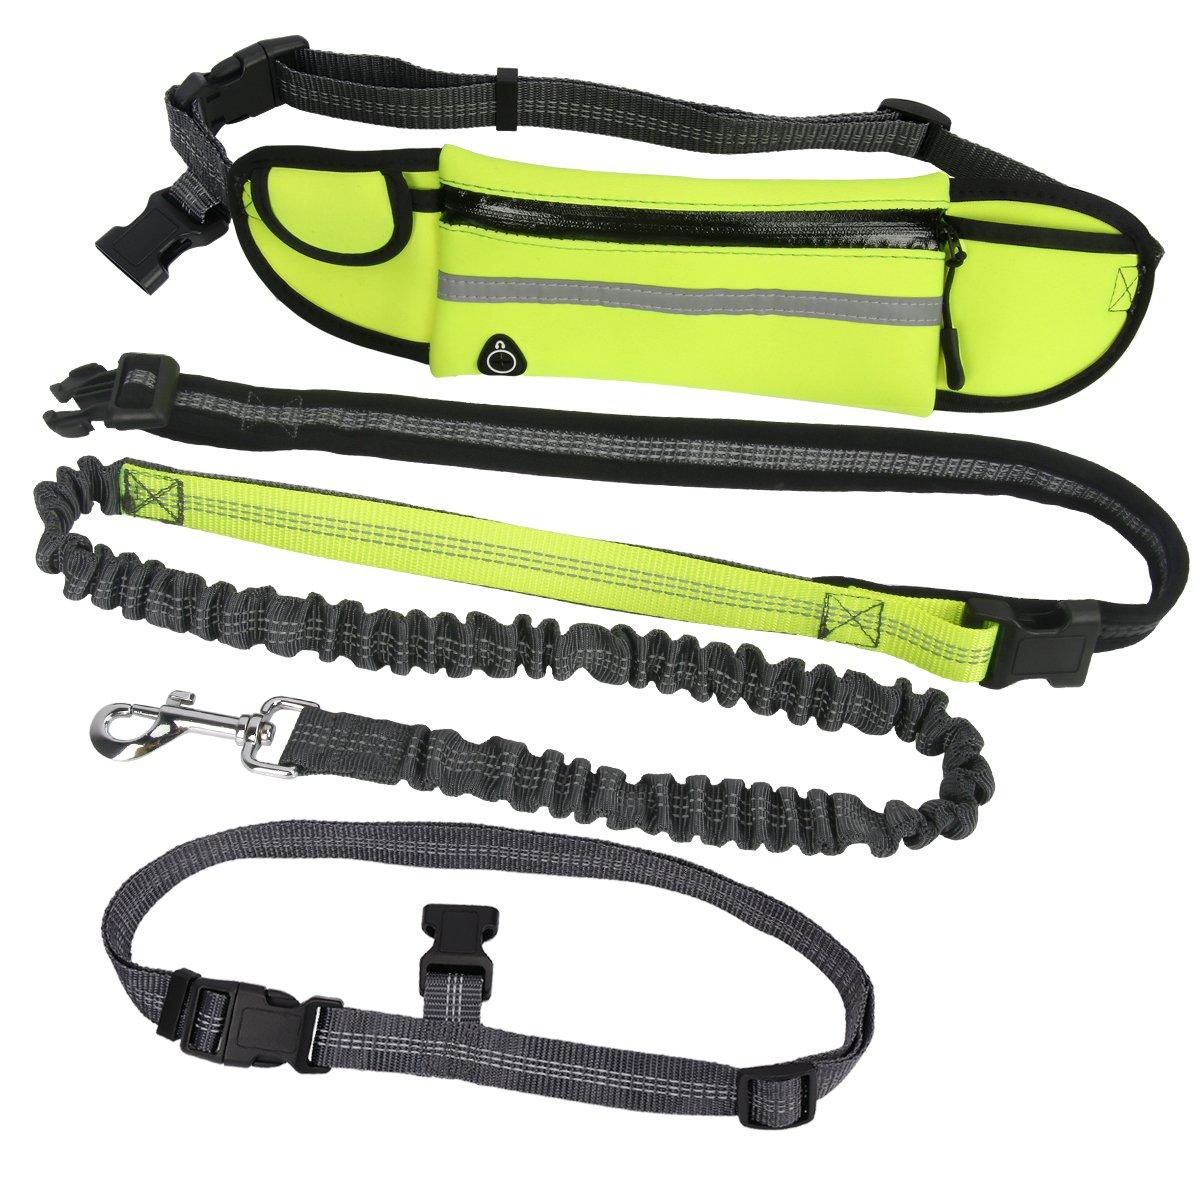 Scheam Hands Free Dog Leash with Pouch Adjustable Waist Belt for Running Training Walking